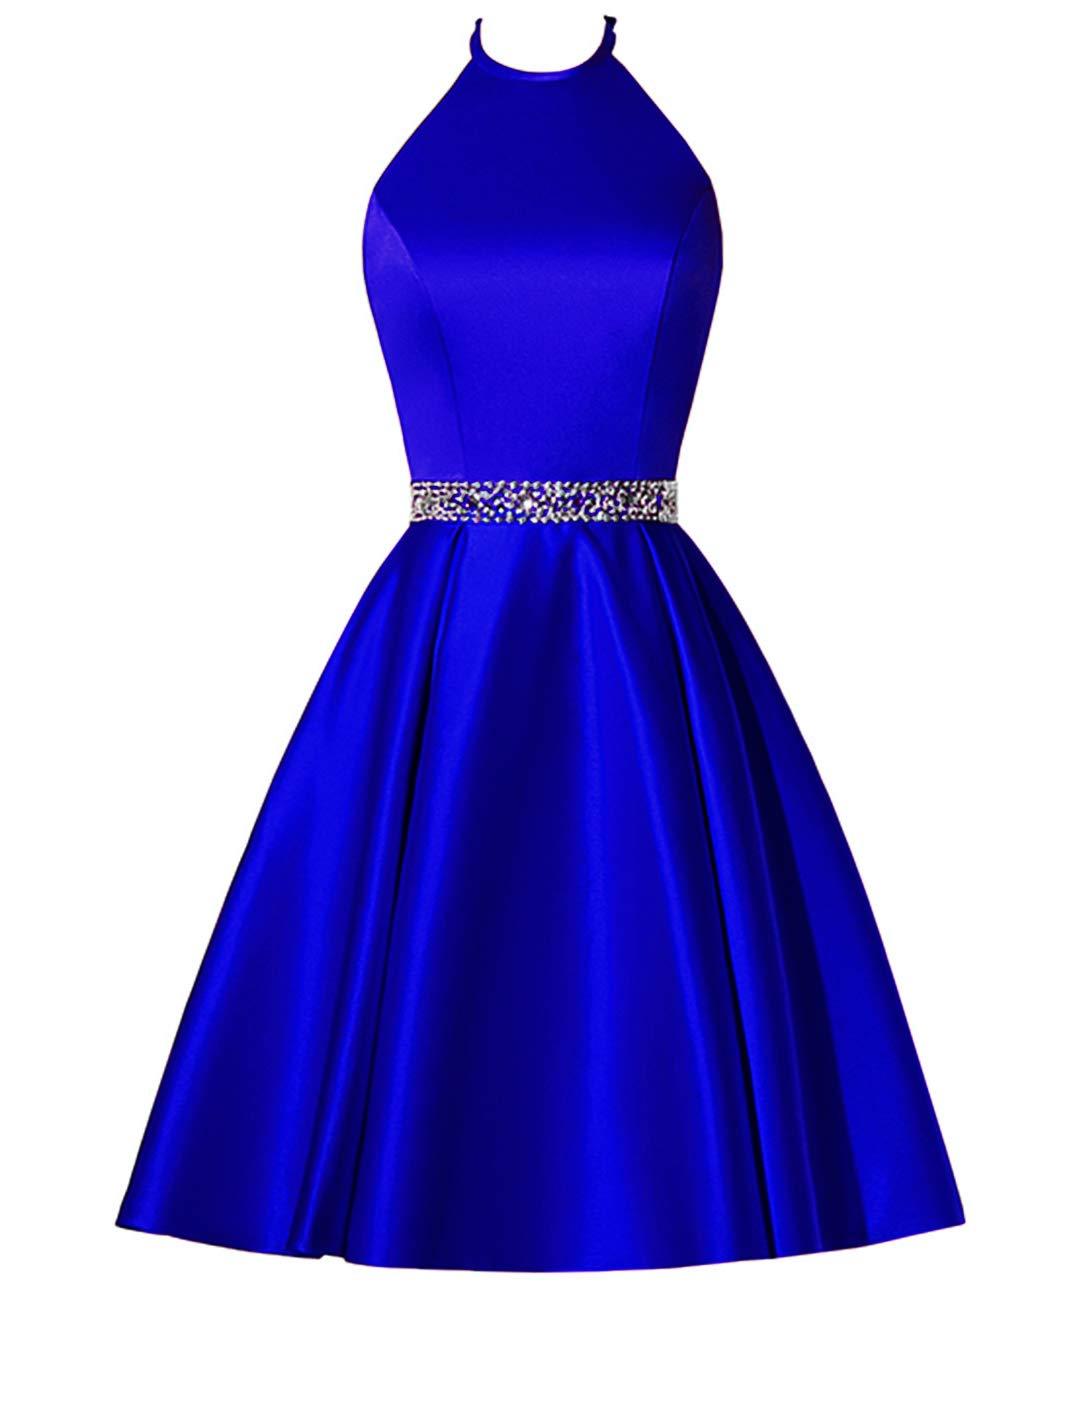 Molisa Satin Halter Homecoming Dresses